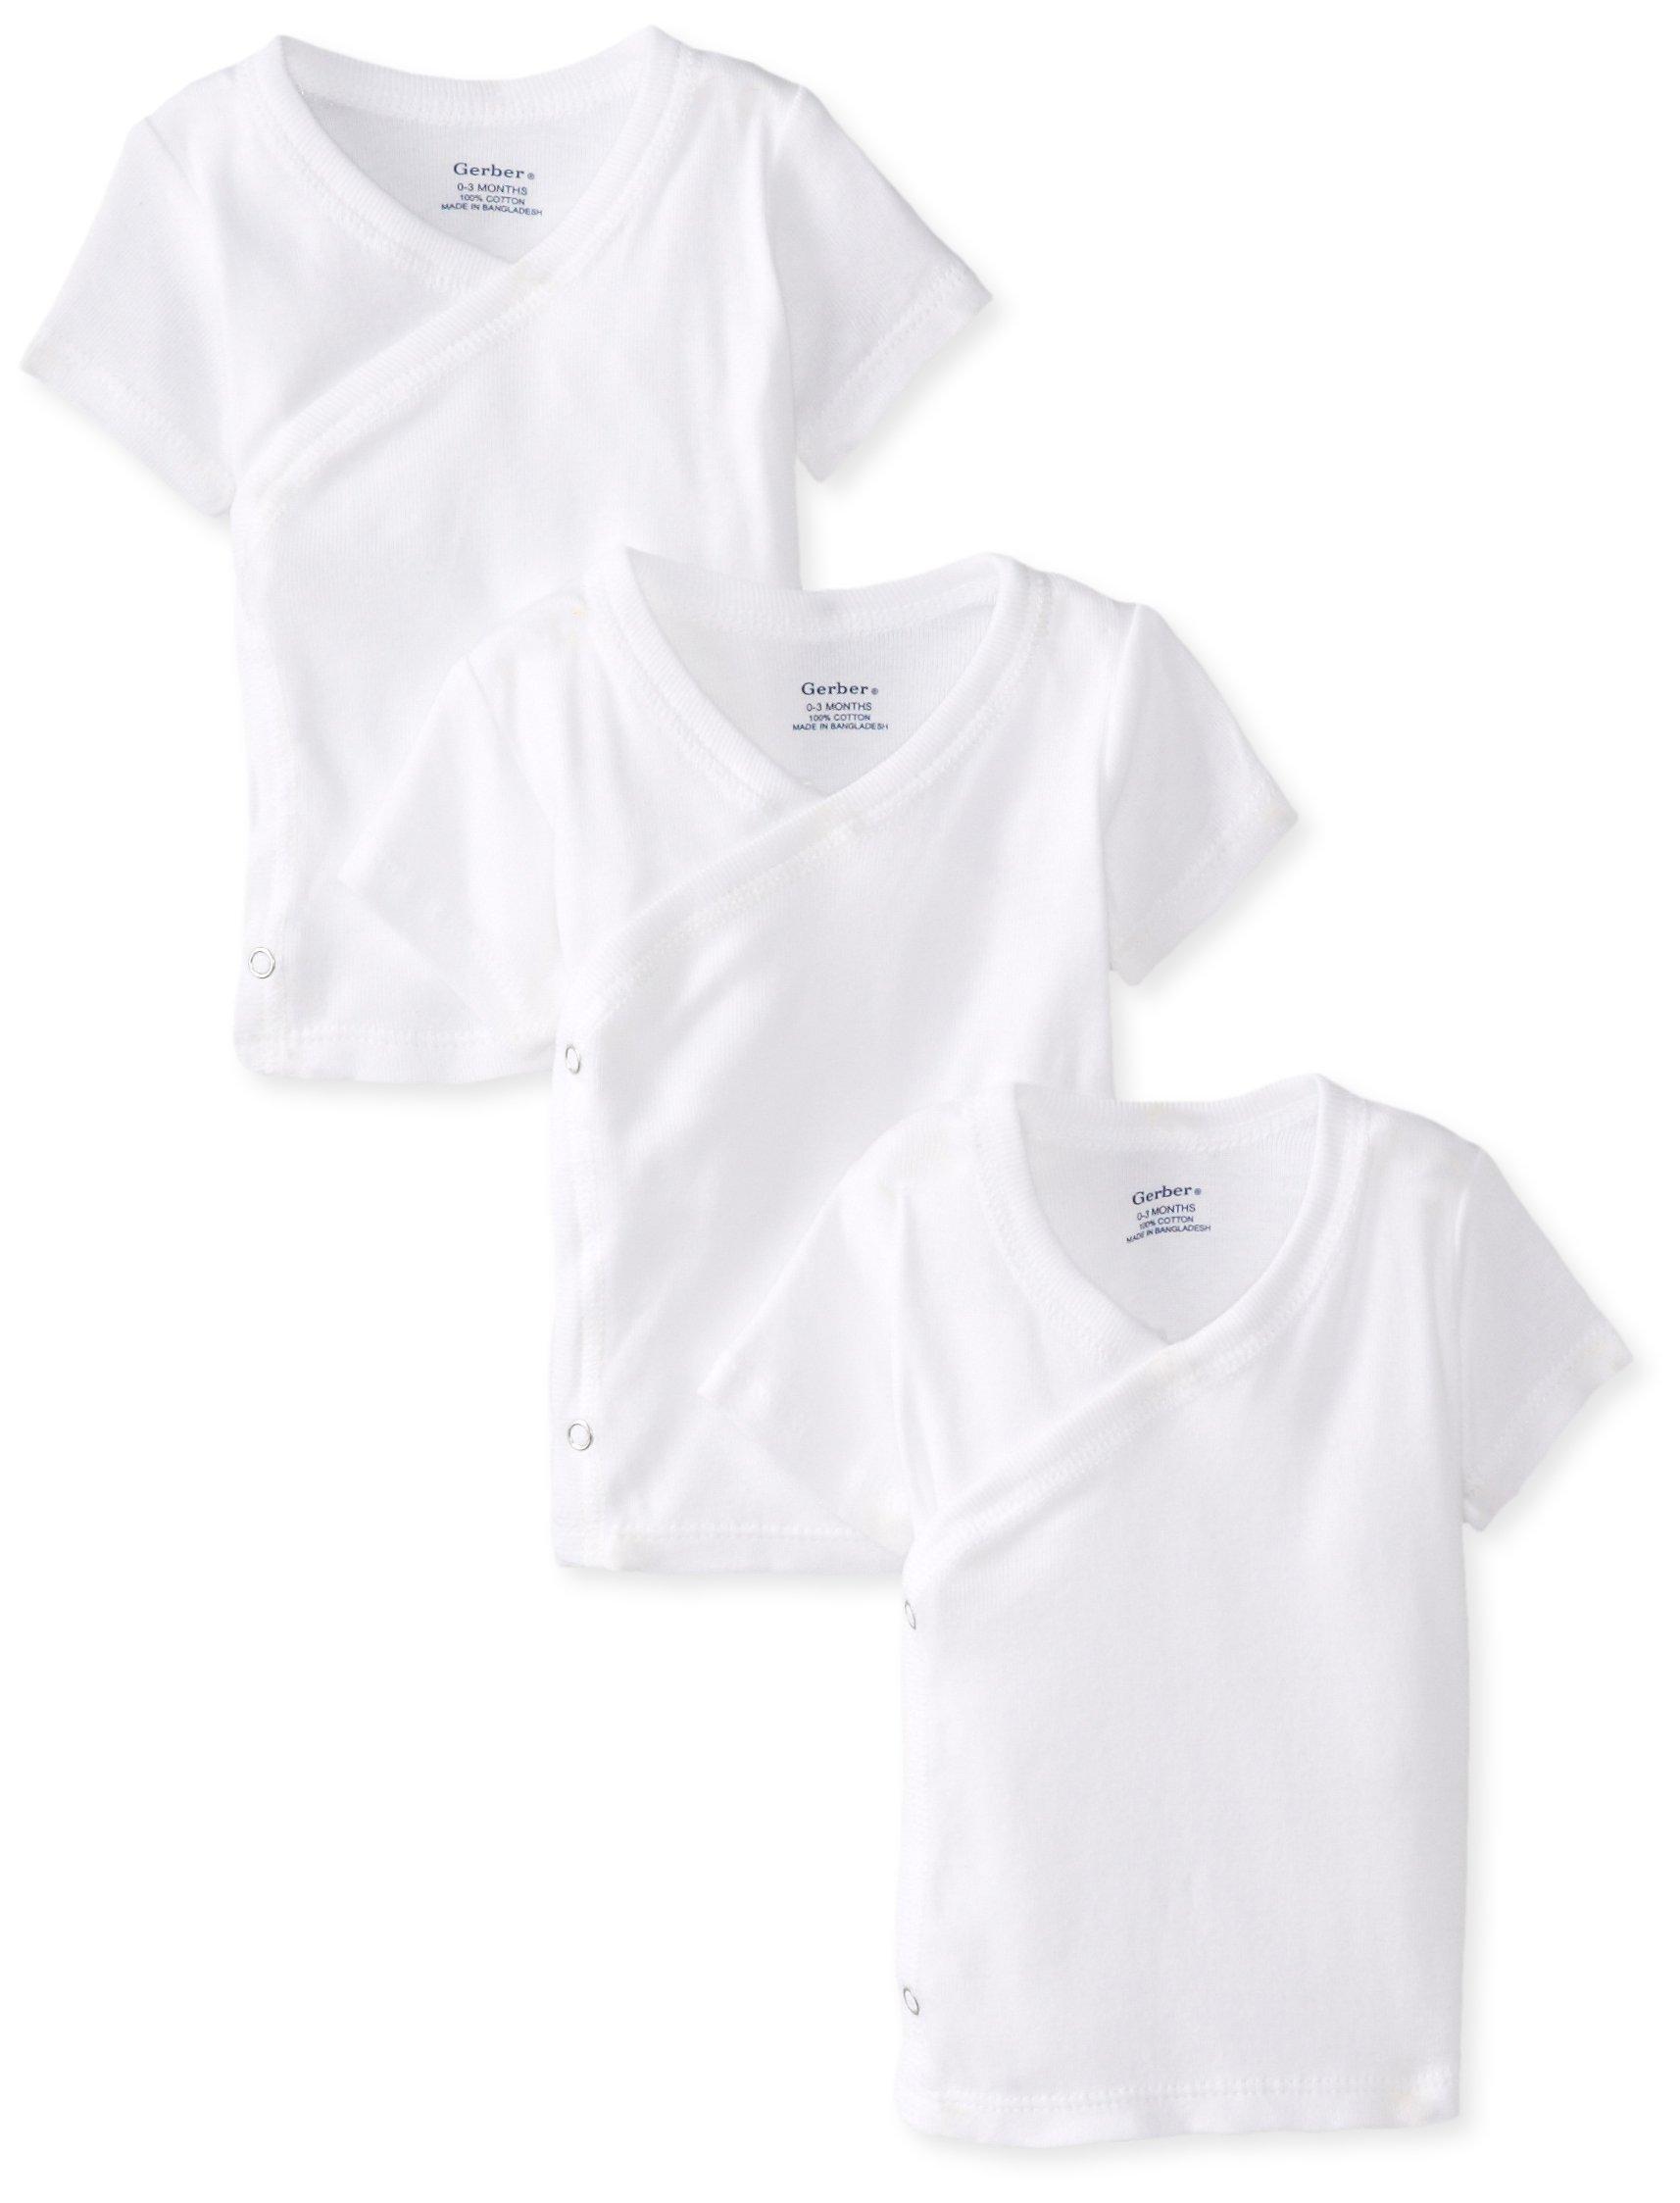 Gerber Baby 3-Pack Short-Sleeve Side-snap Shirt